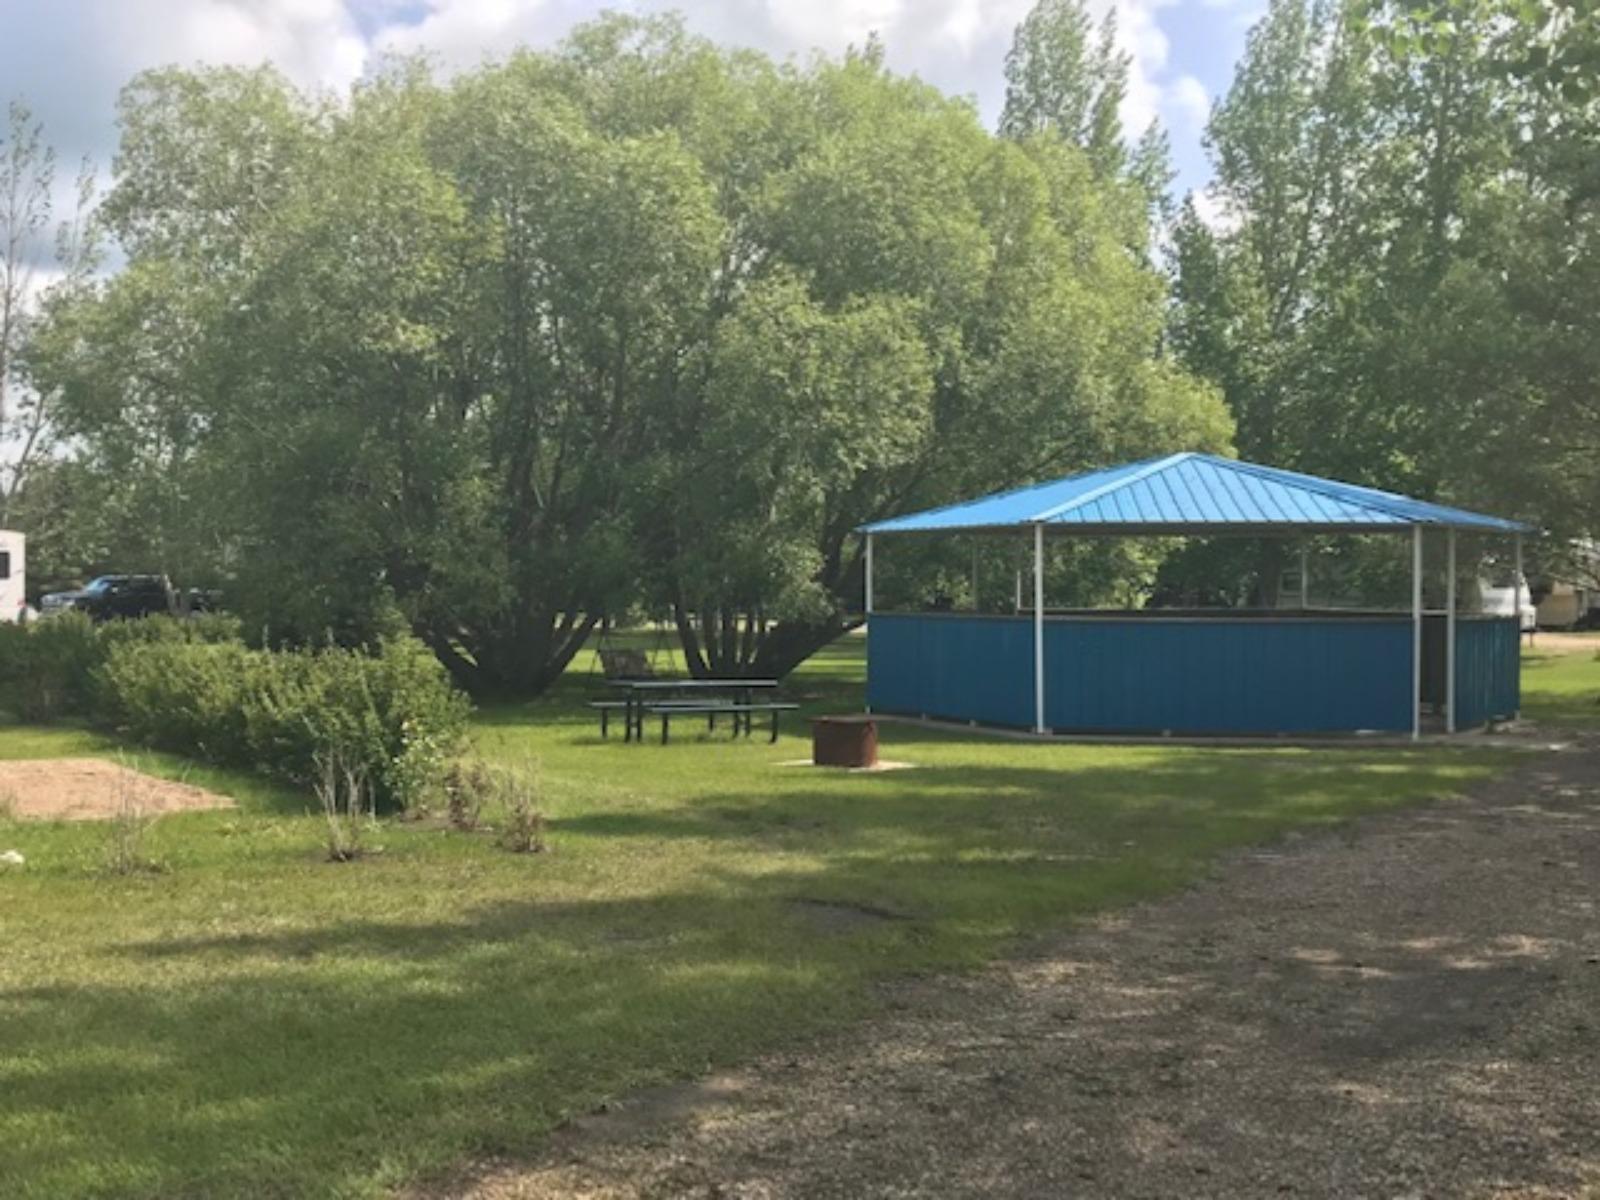 Delfrari Park